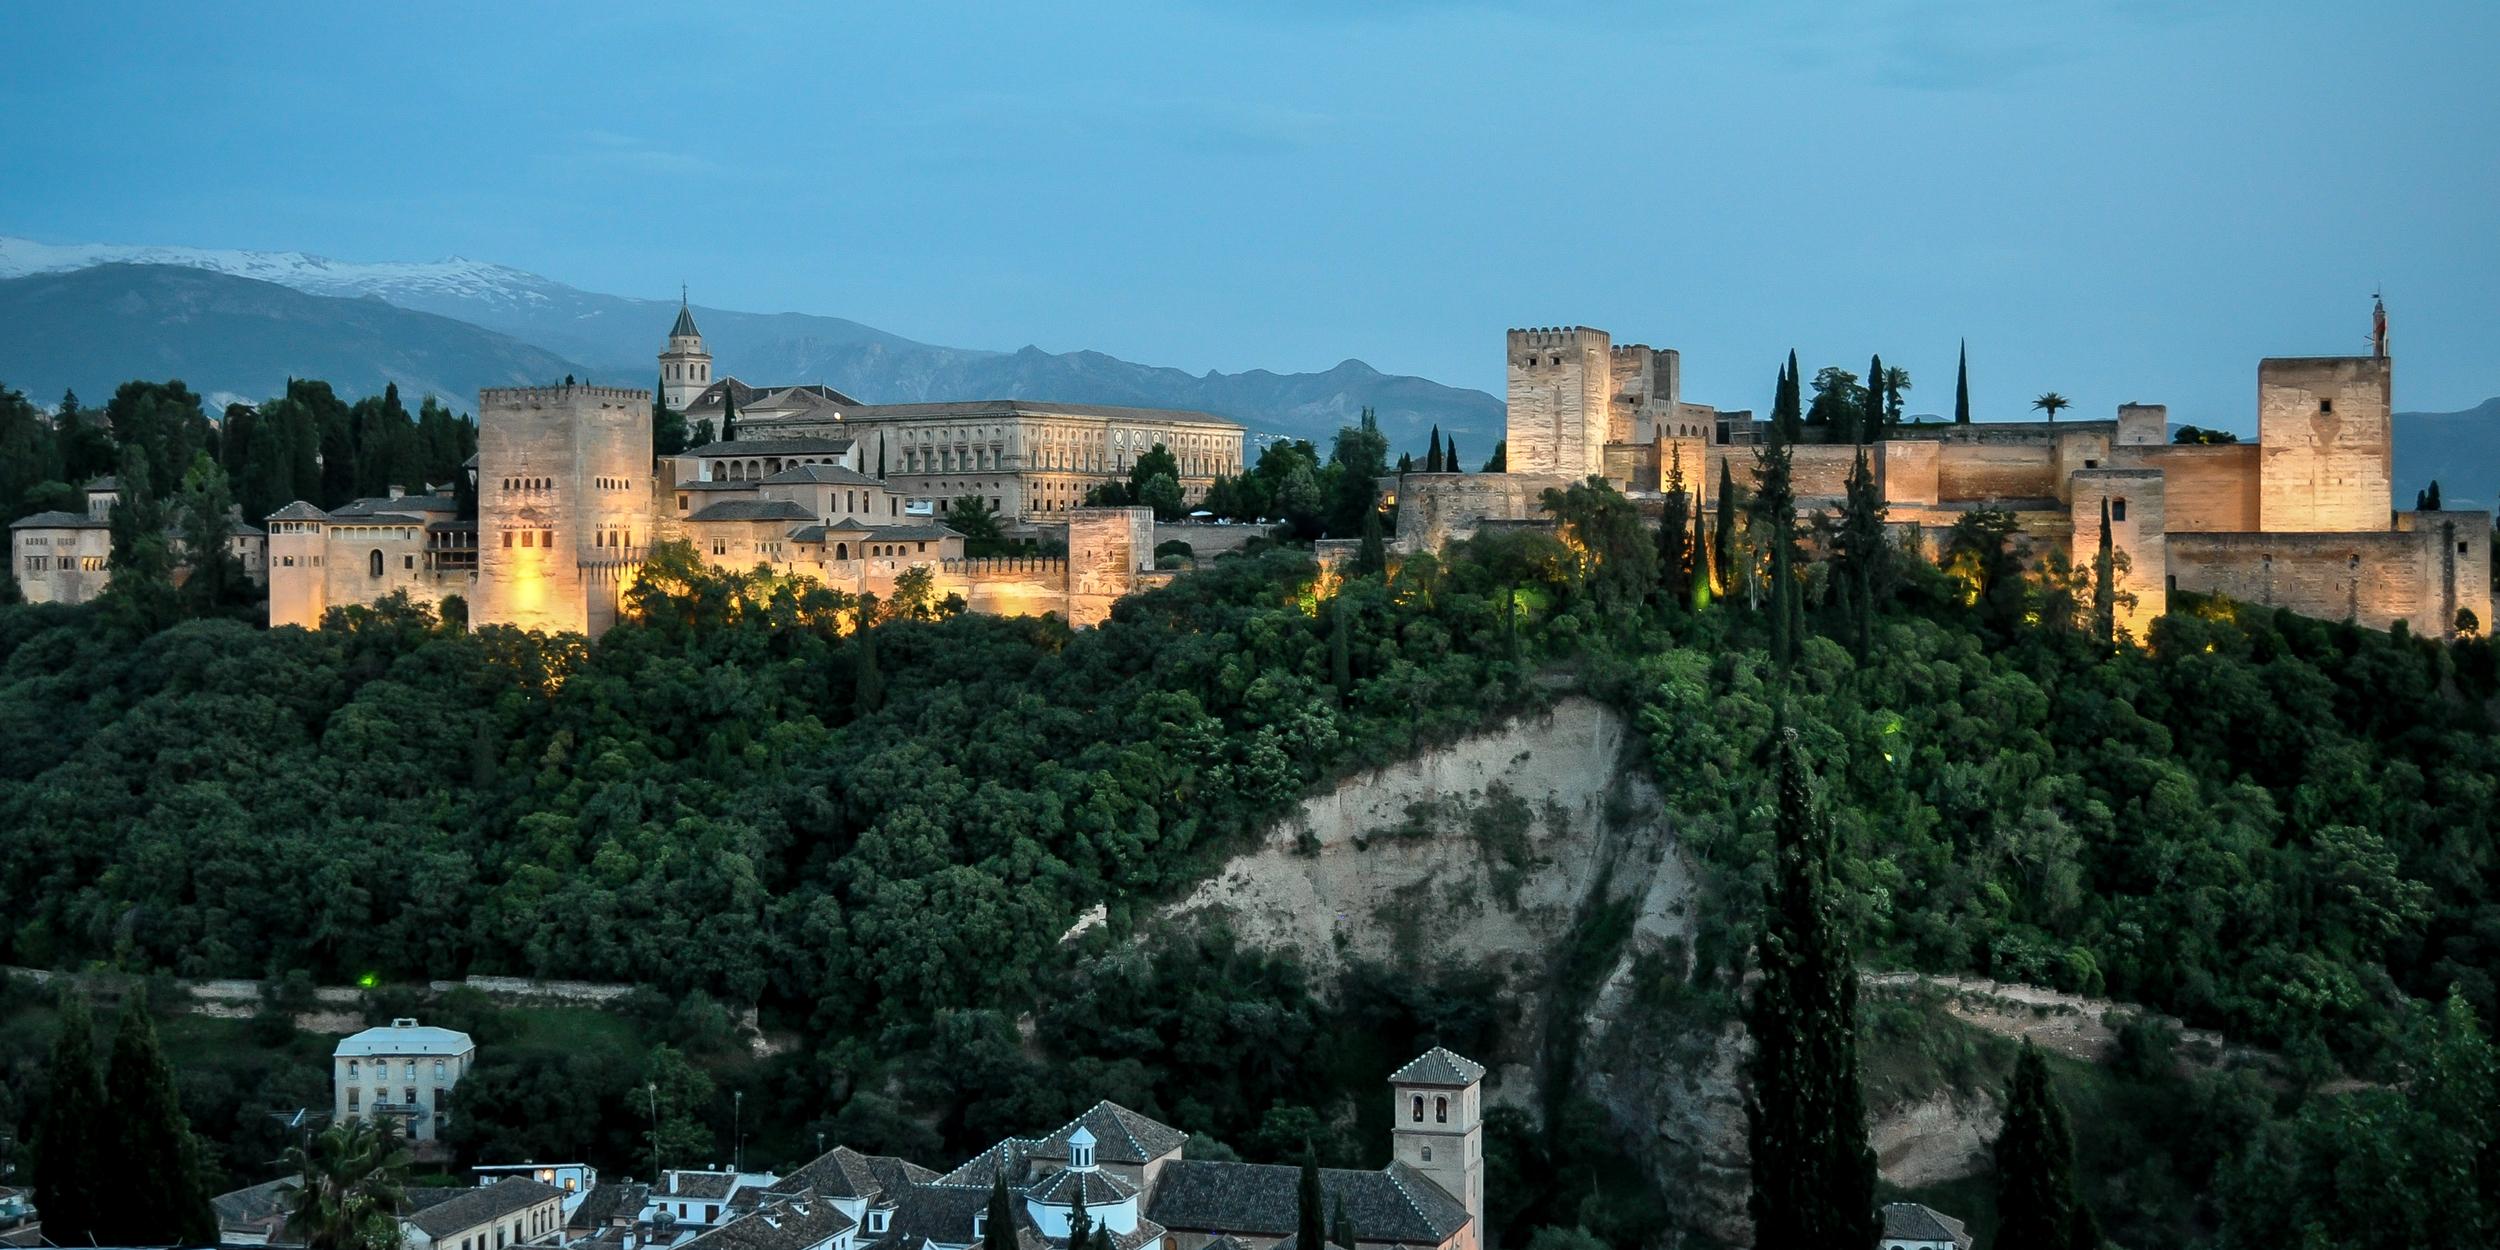 Moorish Magnificence - Alhambra (Granada, Spain)